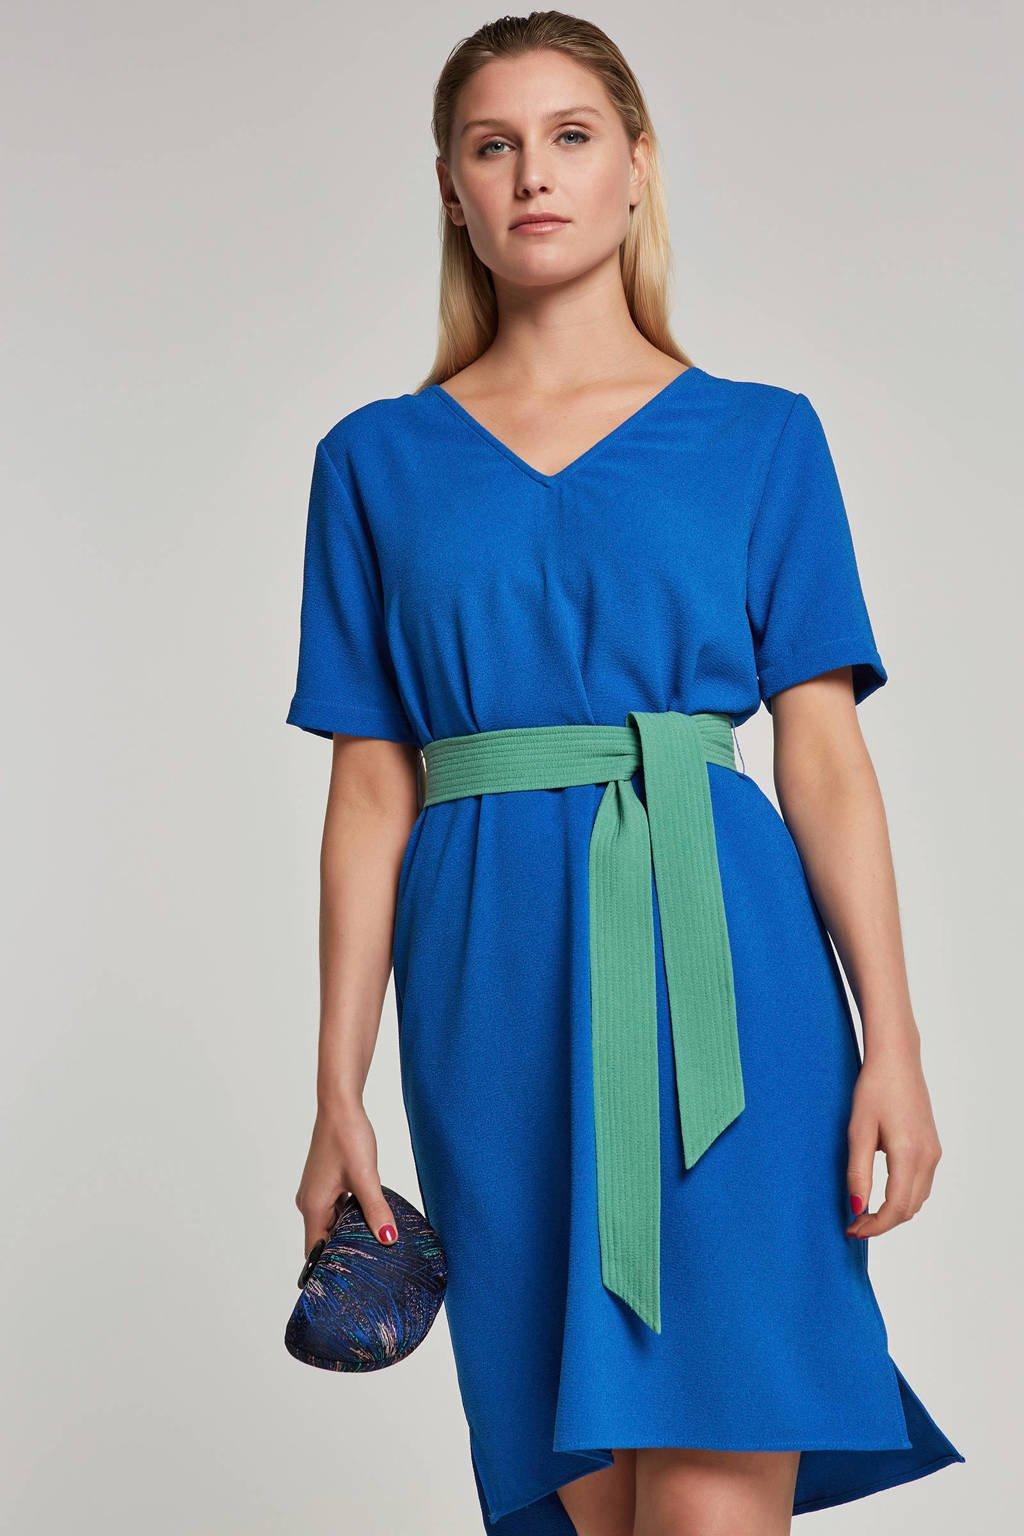 whkmp's own jurk, Kobaltblauw/groen